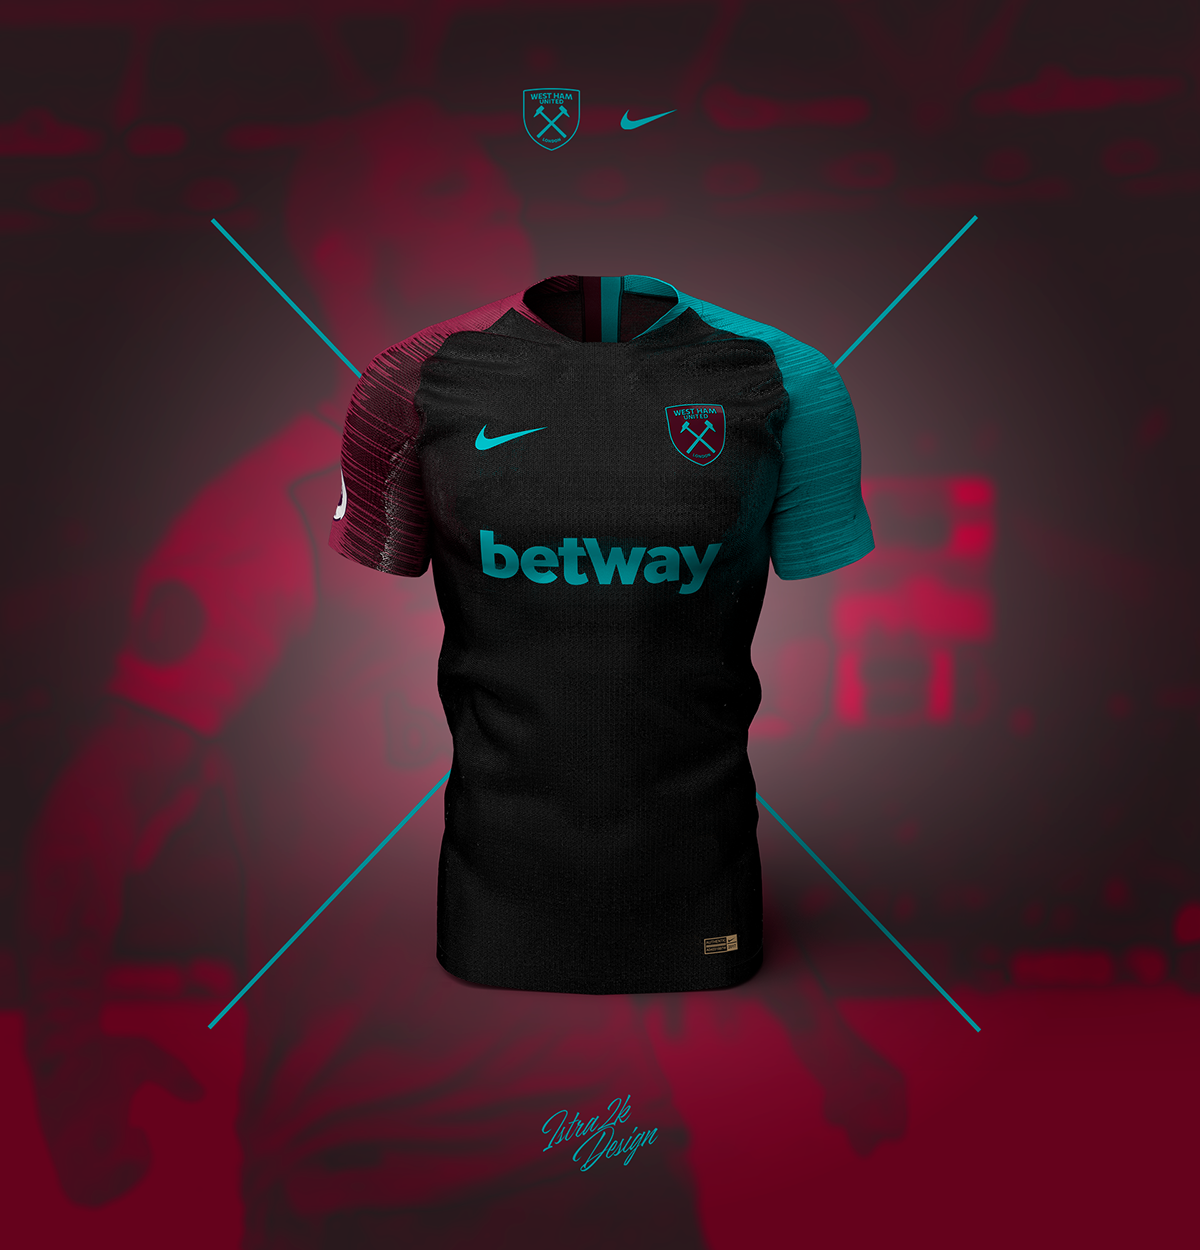 new product b61c5 d3466 West Ham United x Nike on Behance